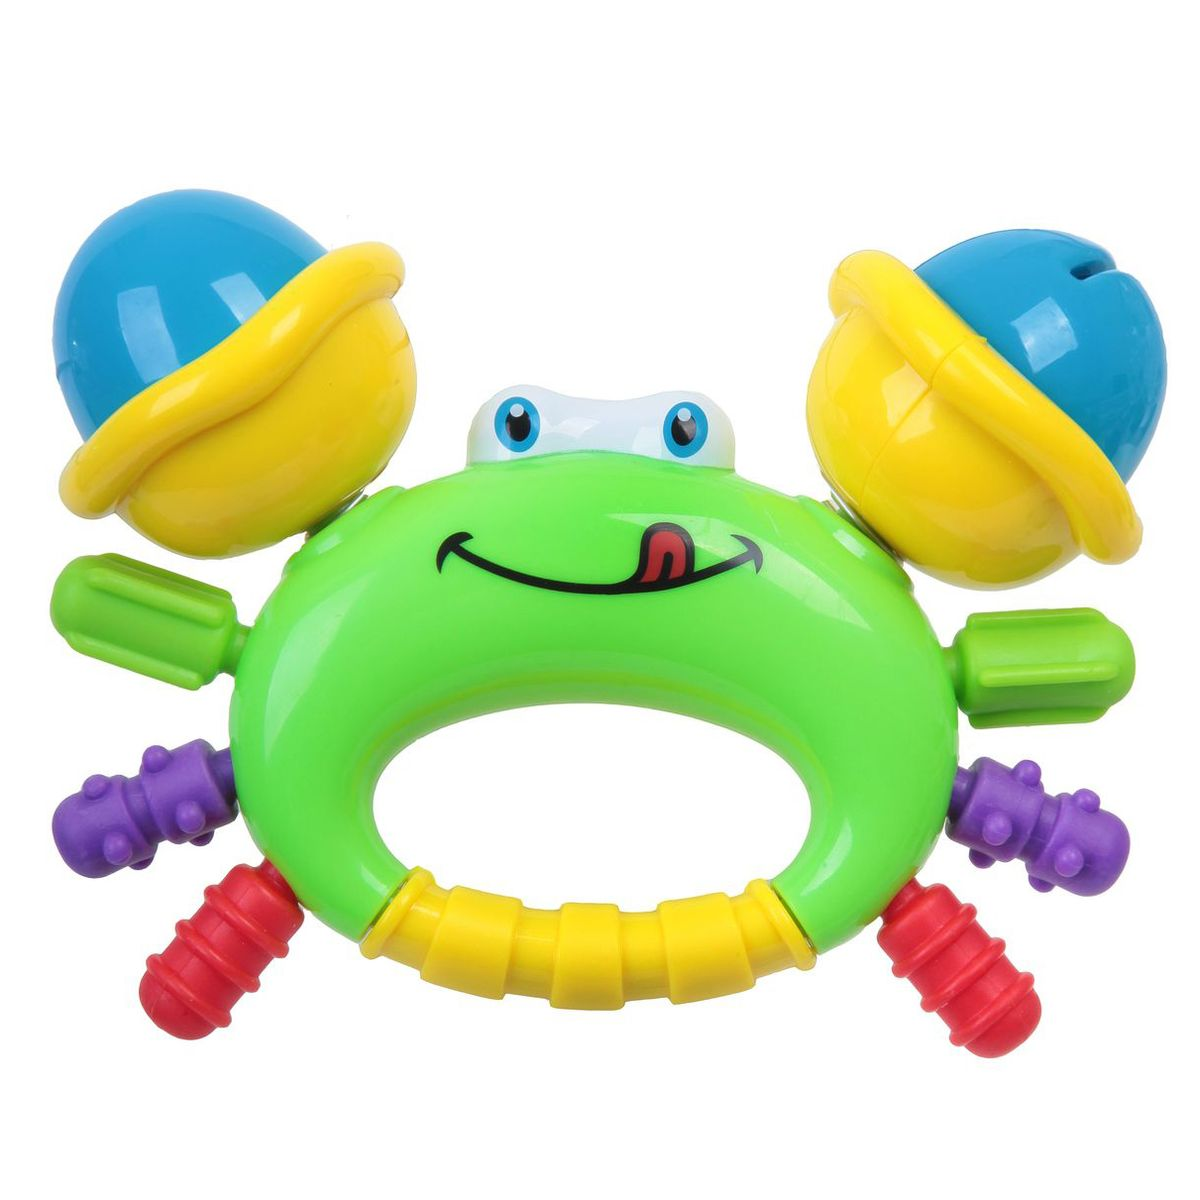 Bondibon Погремушка Крабик bondibon мягкая игрушка погремушка слоник